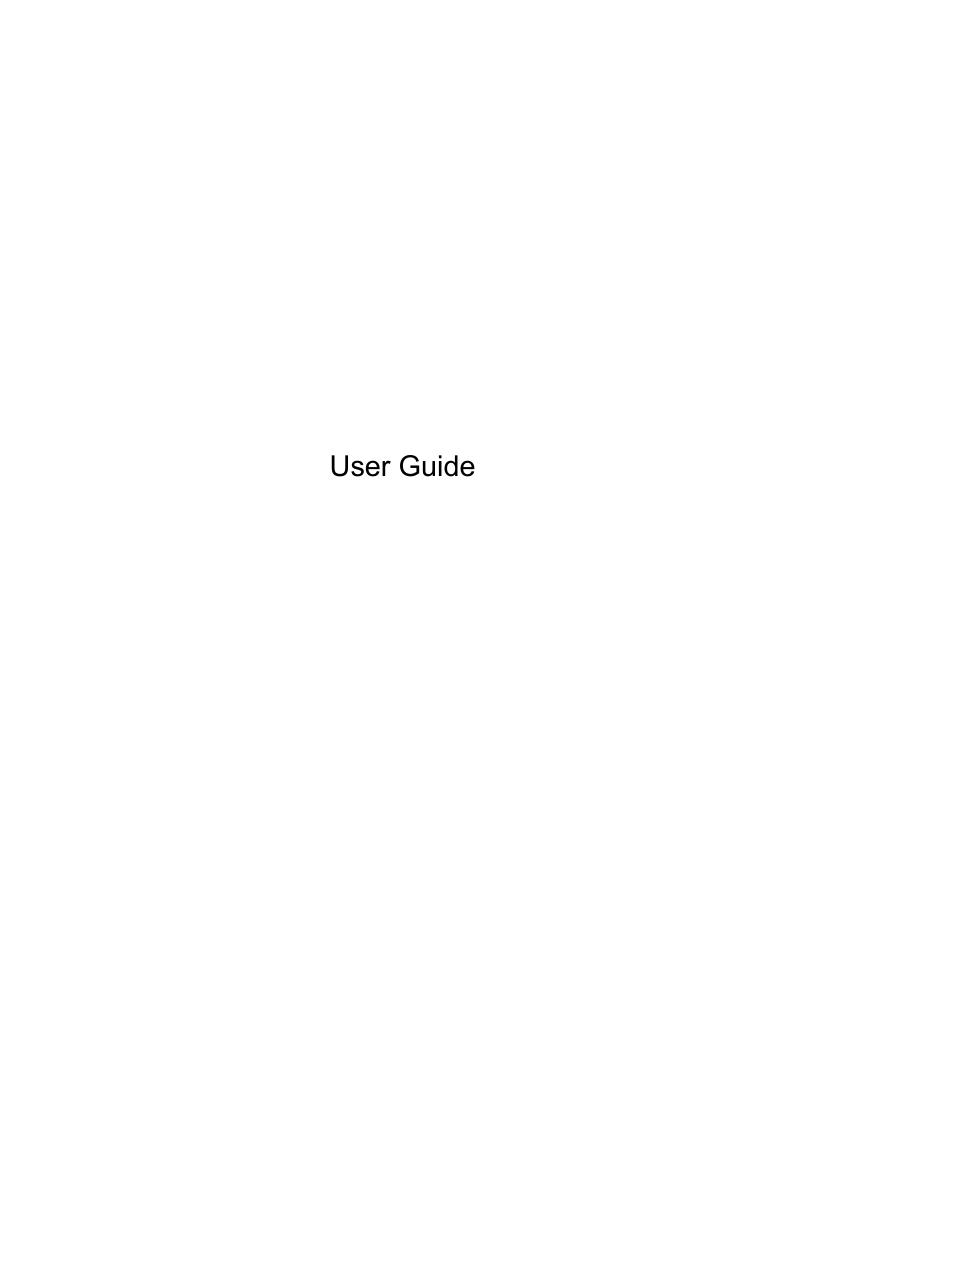 hp probook 645 g1 notebook pc user manual 115 pages also for rh manualsdir com elitebook 820 g1 user guide hp elitebook 820 g1 user guide